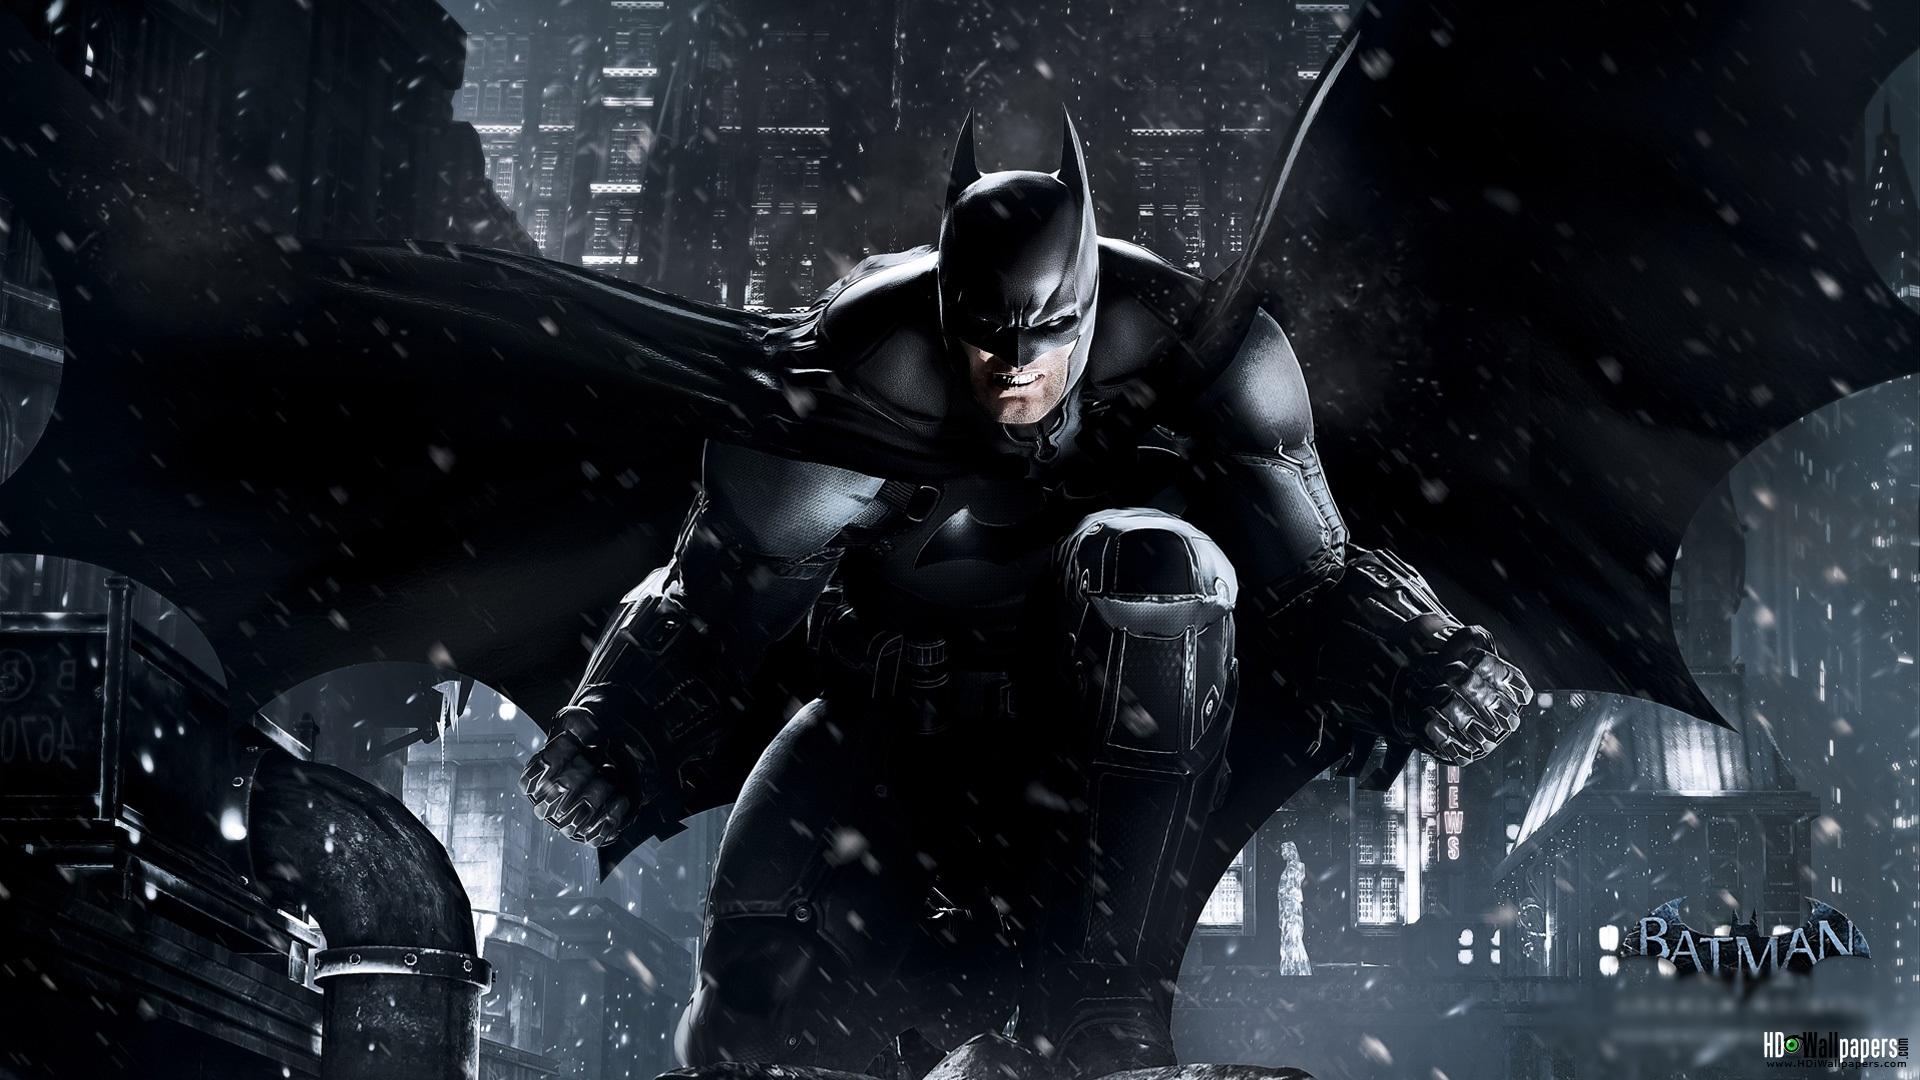 batman v superman dawn of justice wallpaper stock pictures n04711im 1920x1080